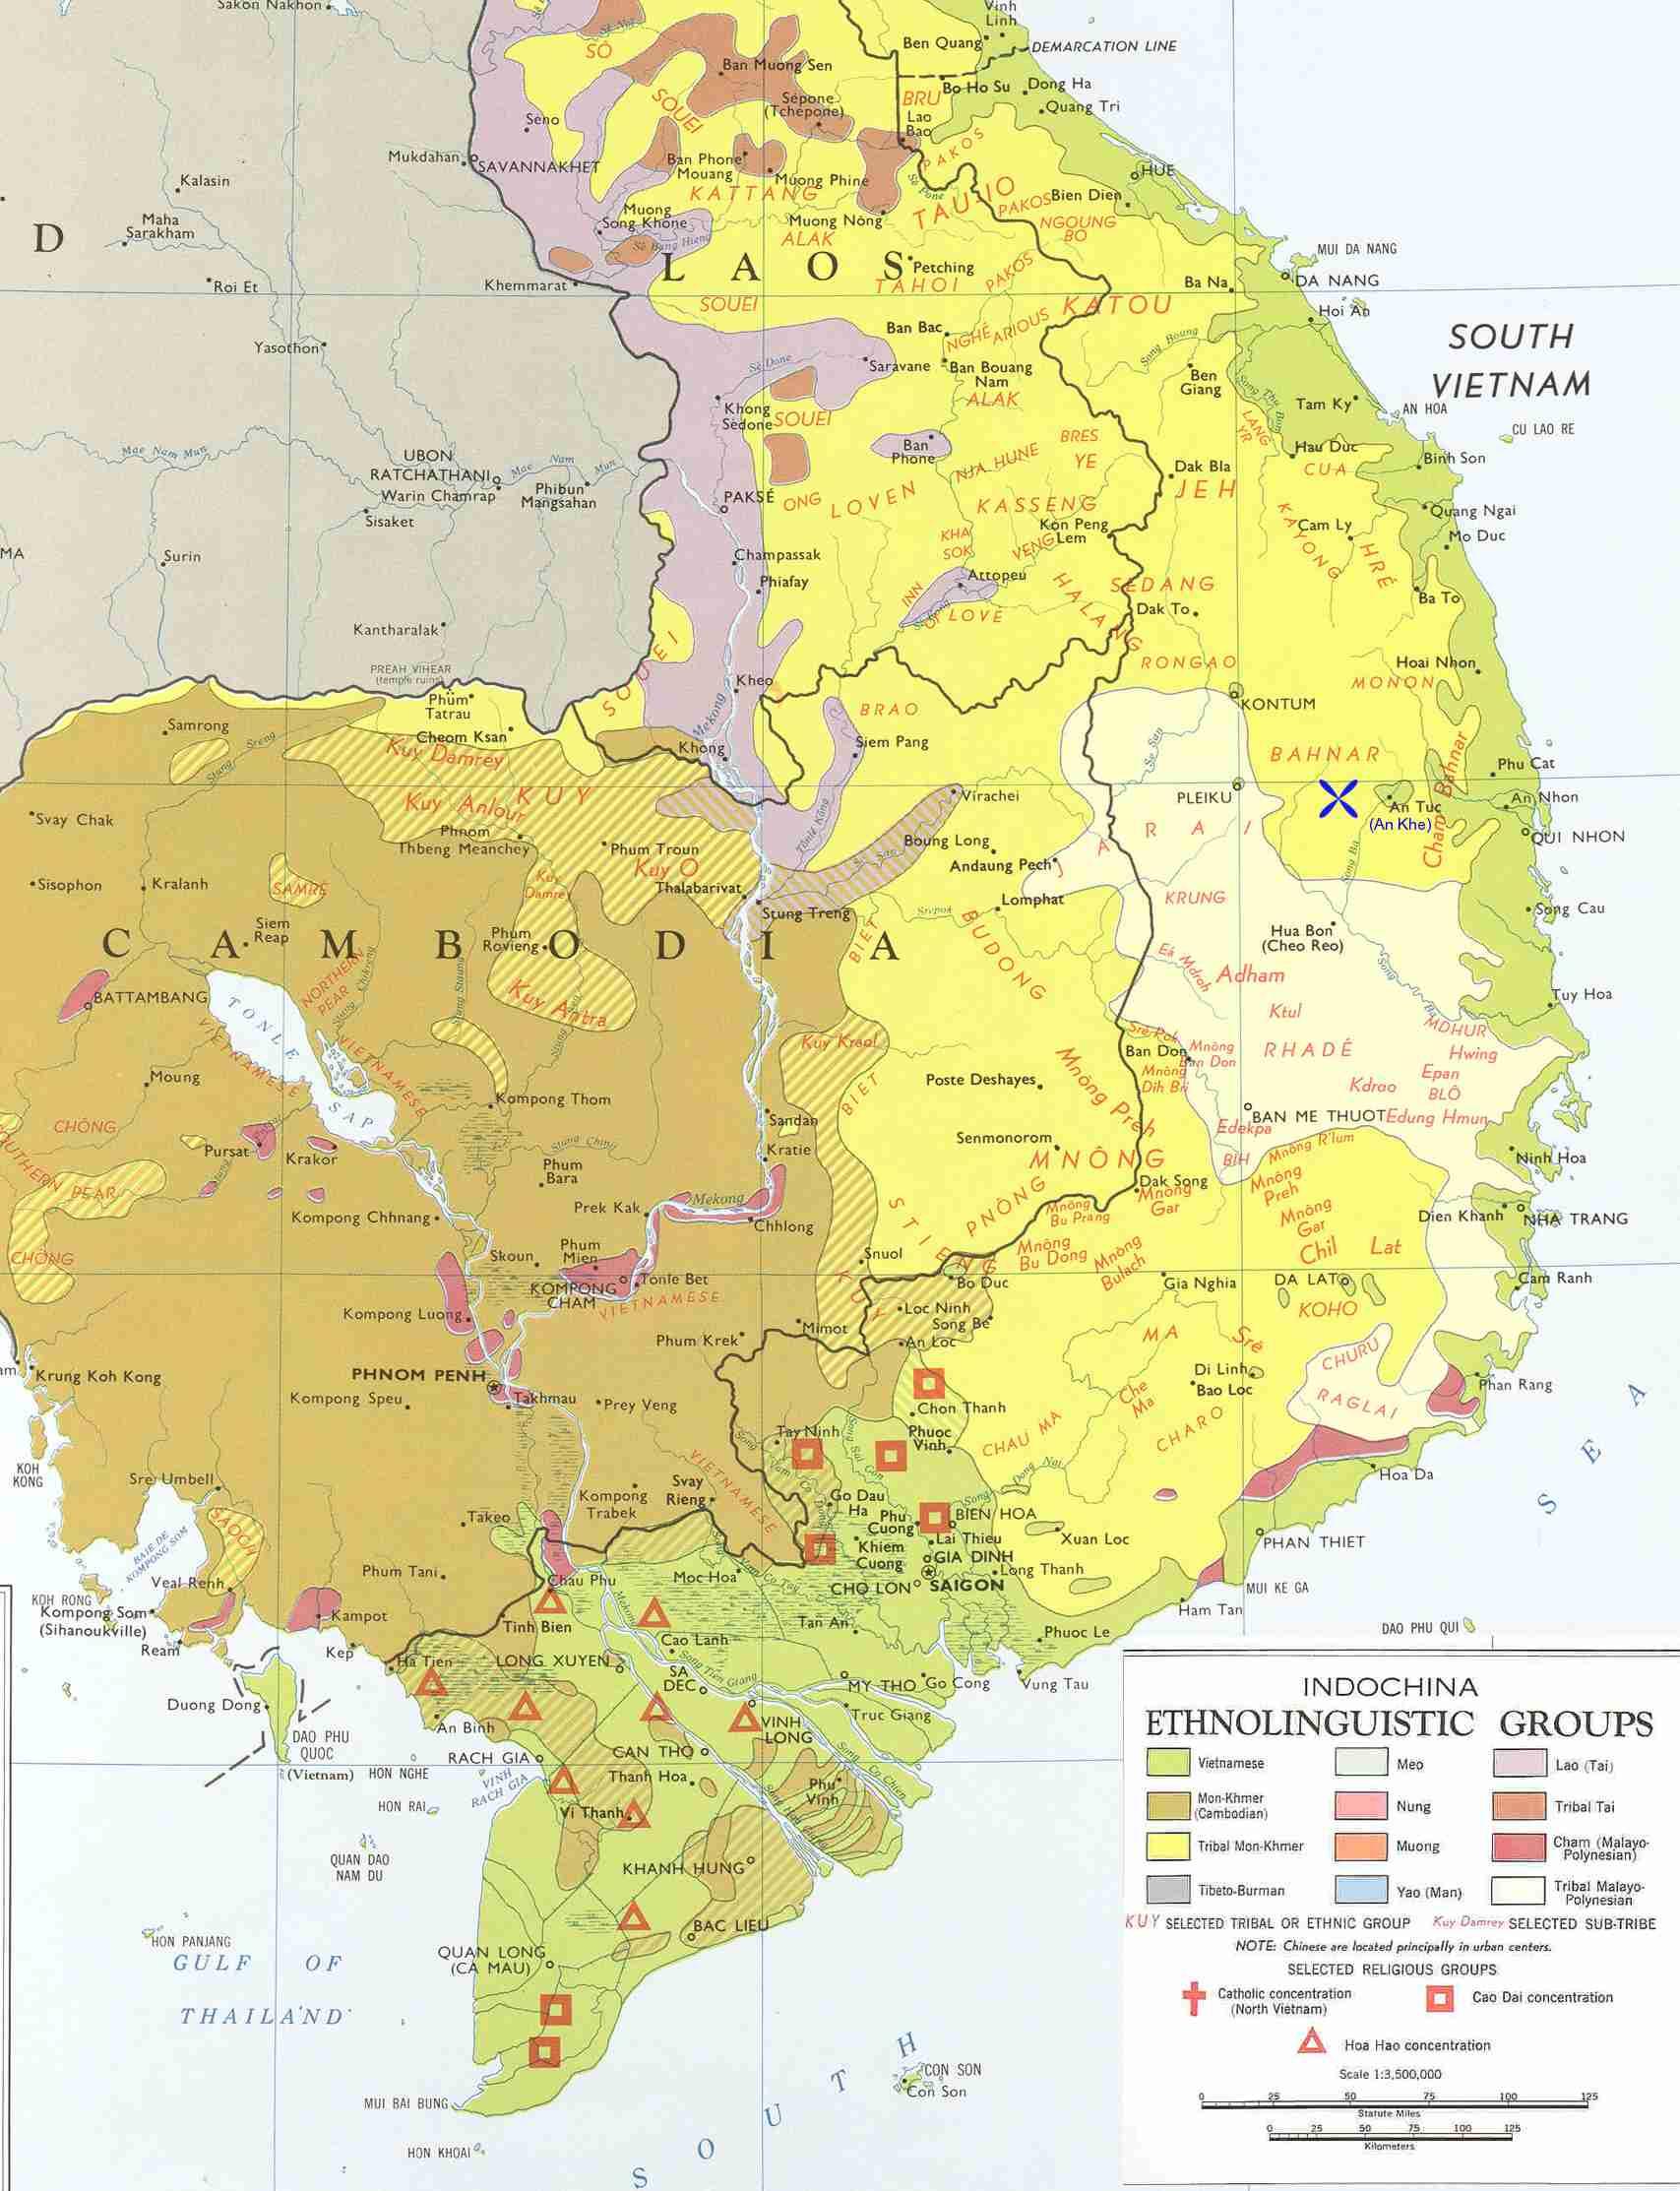 Ethno Linguistic Groups S Vietnam